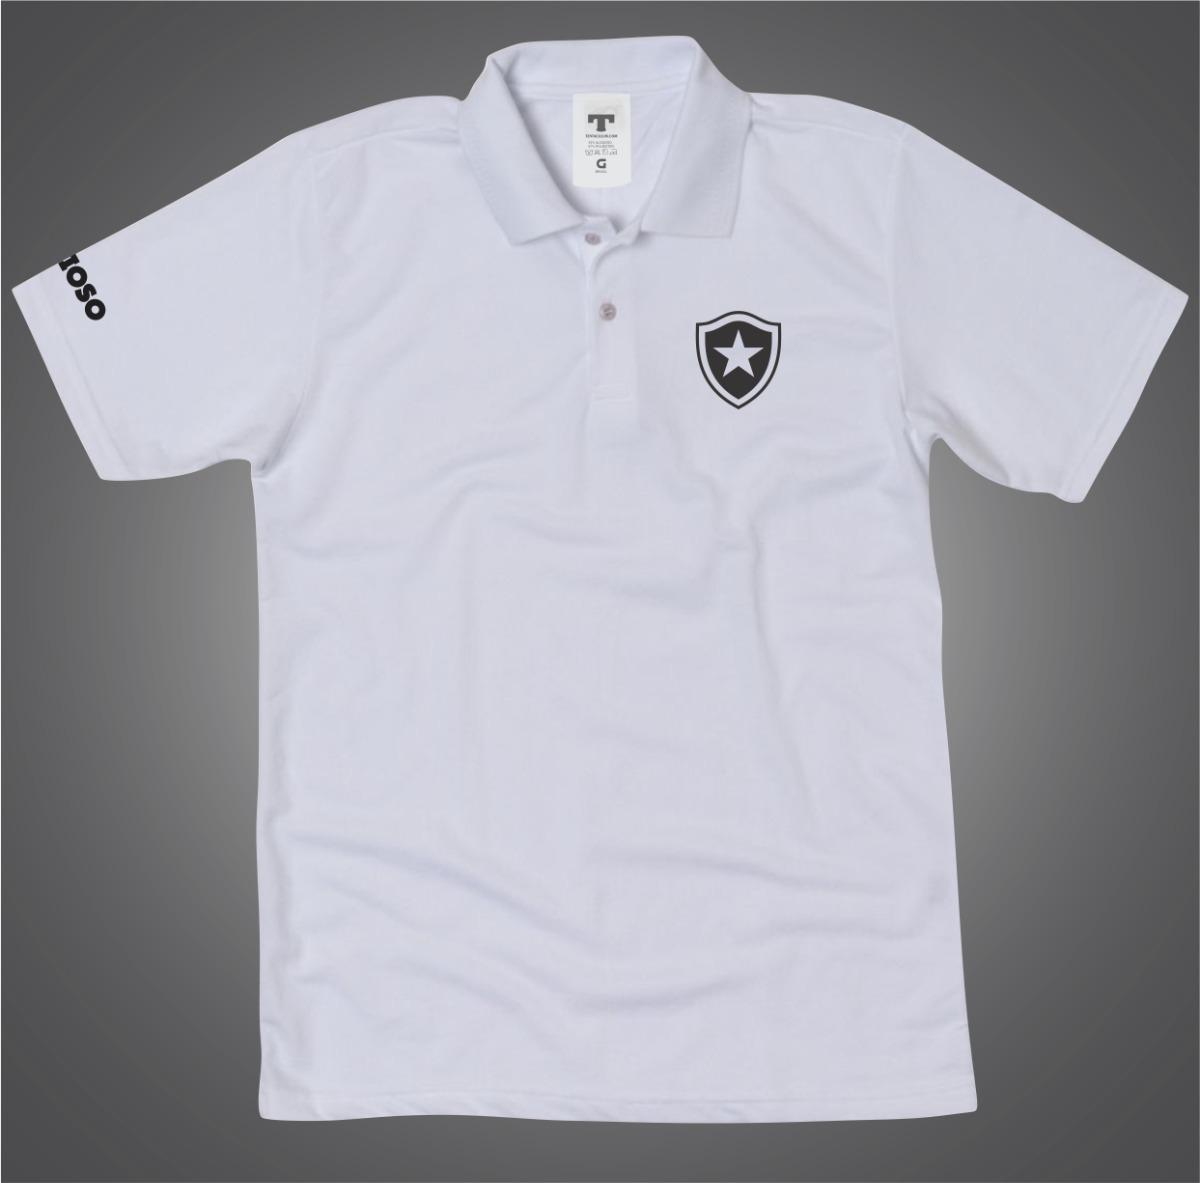 e31f7bce35945 camisa polo botafogo torcedor glorioso carioca masculino. Carregando zoom.